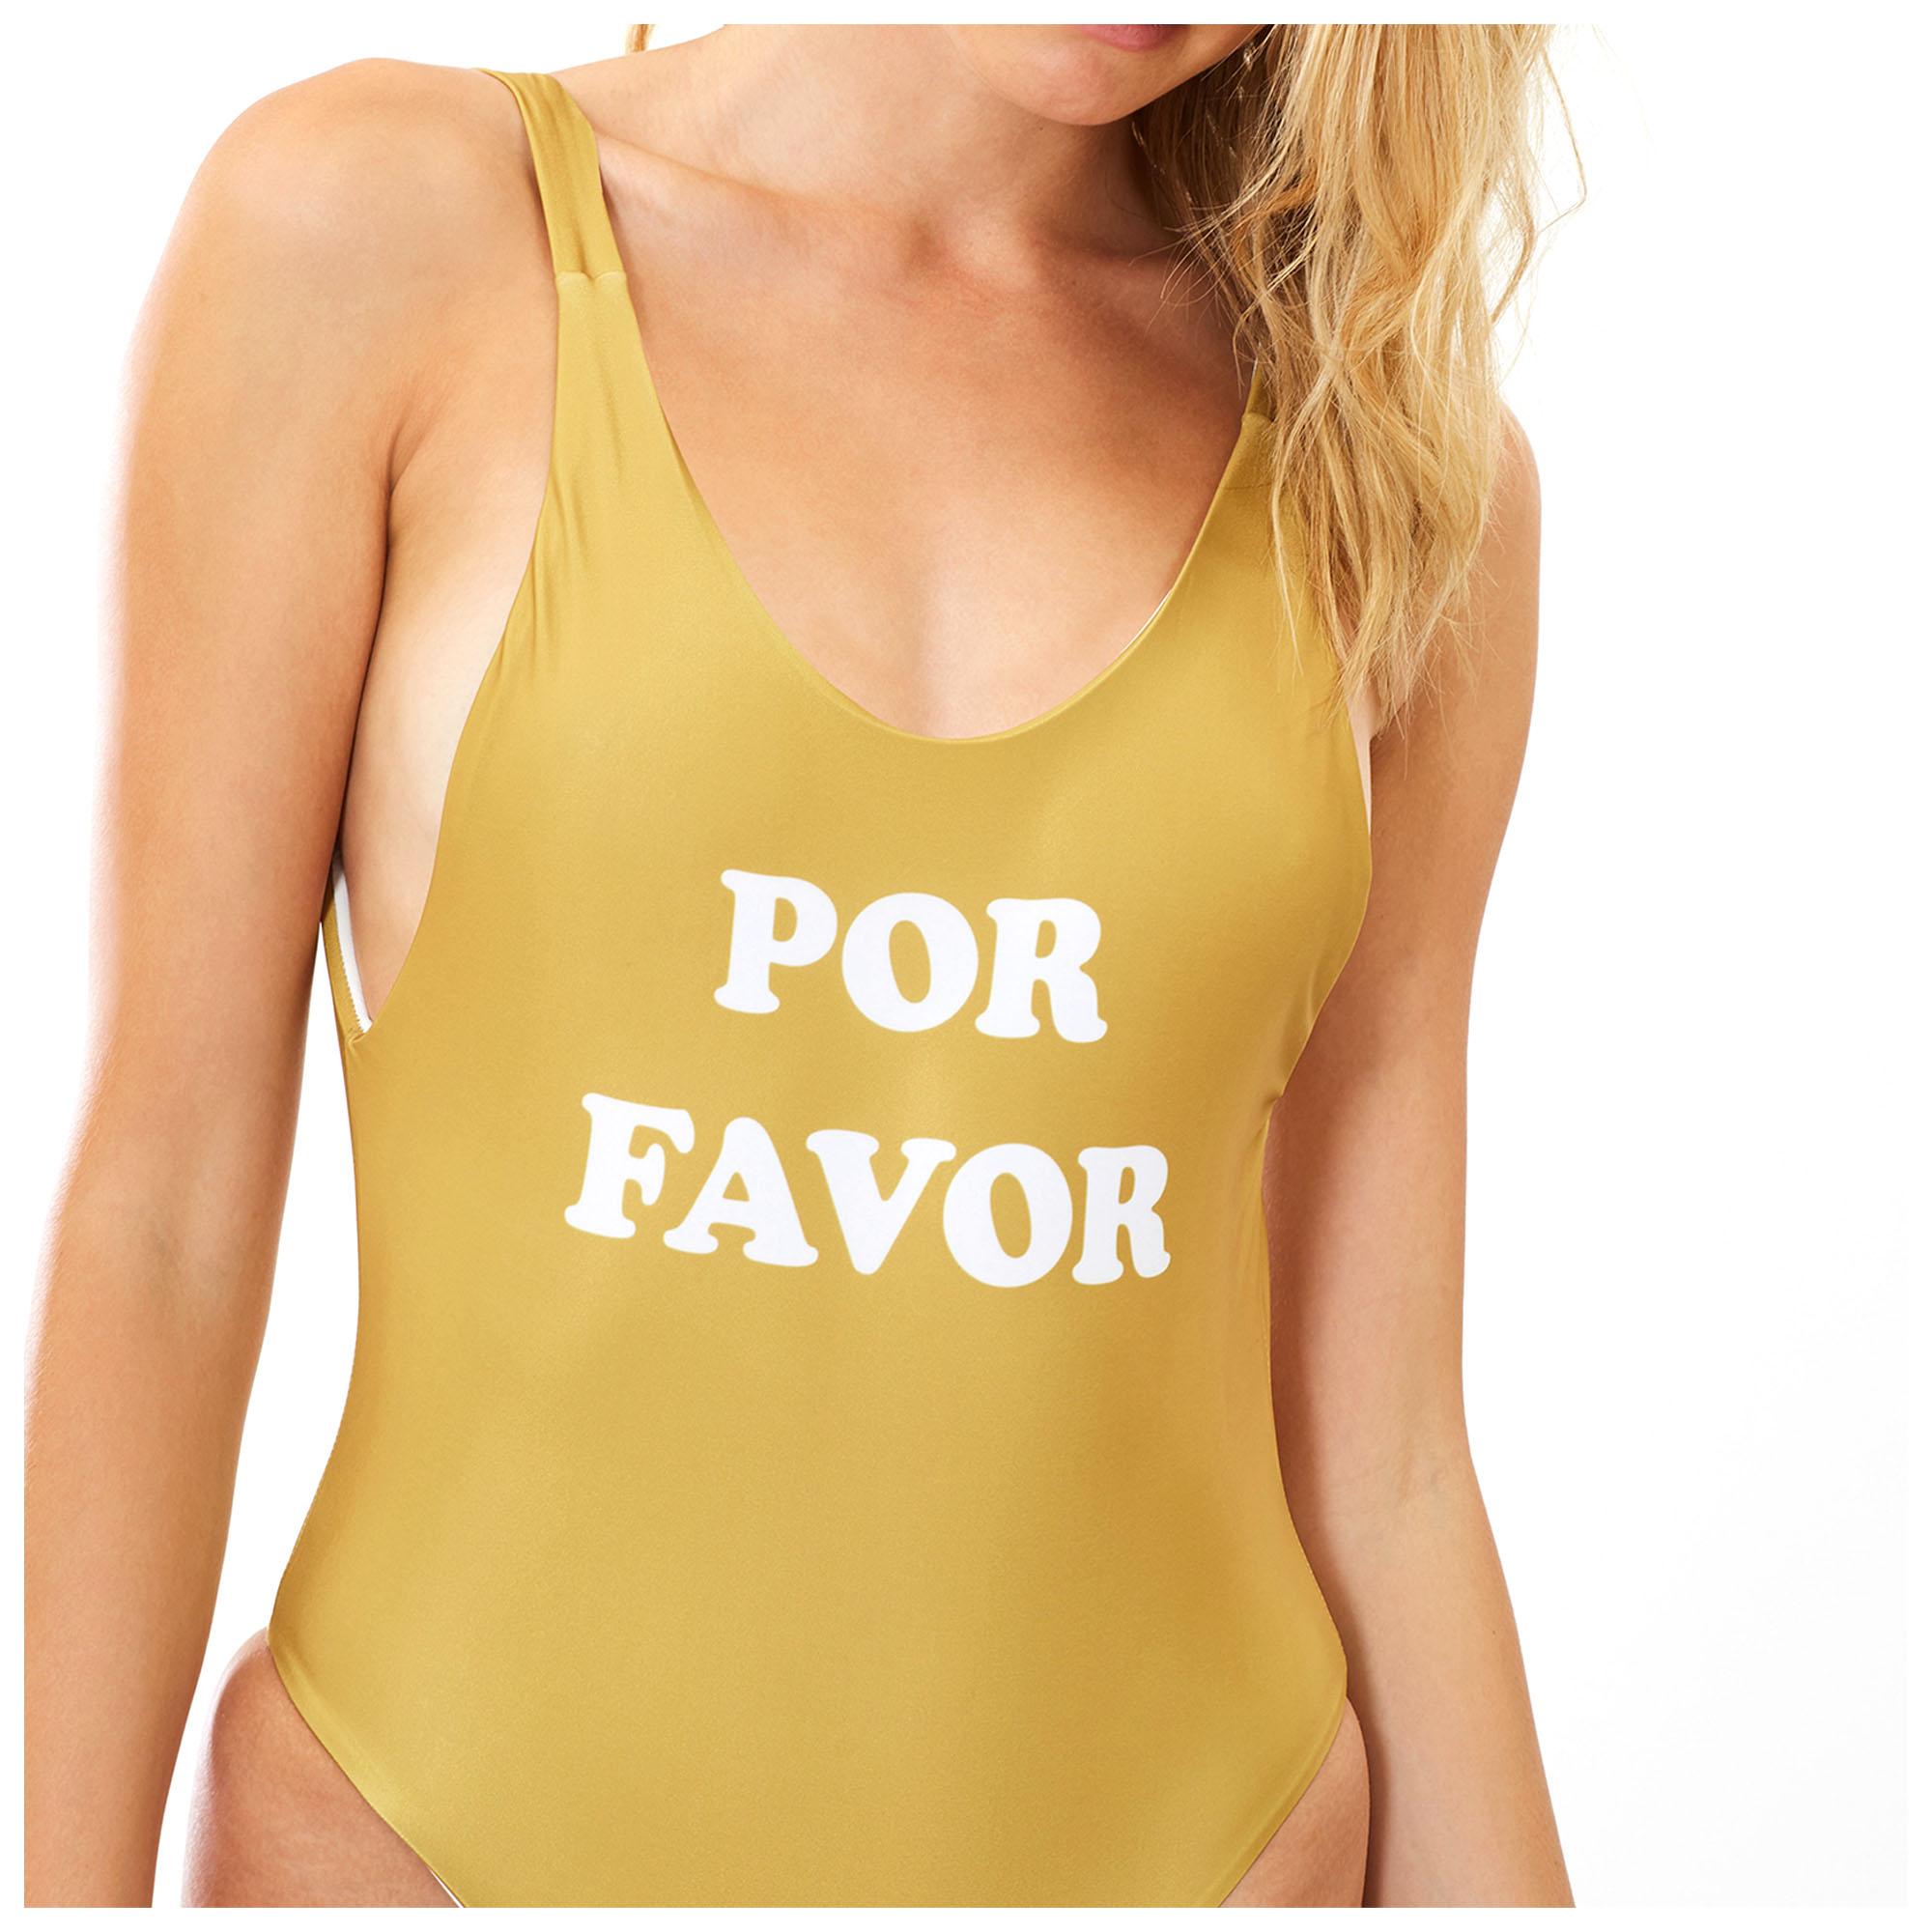 253f55cf8d19 Charlie Holiday Women's Por Favor One Piece Swimsuit - Sun & Ski Sports